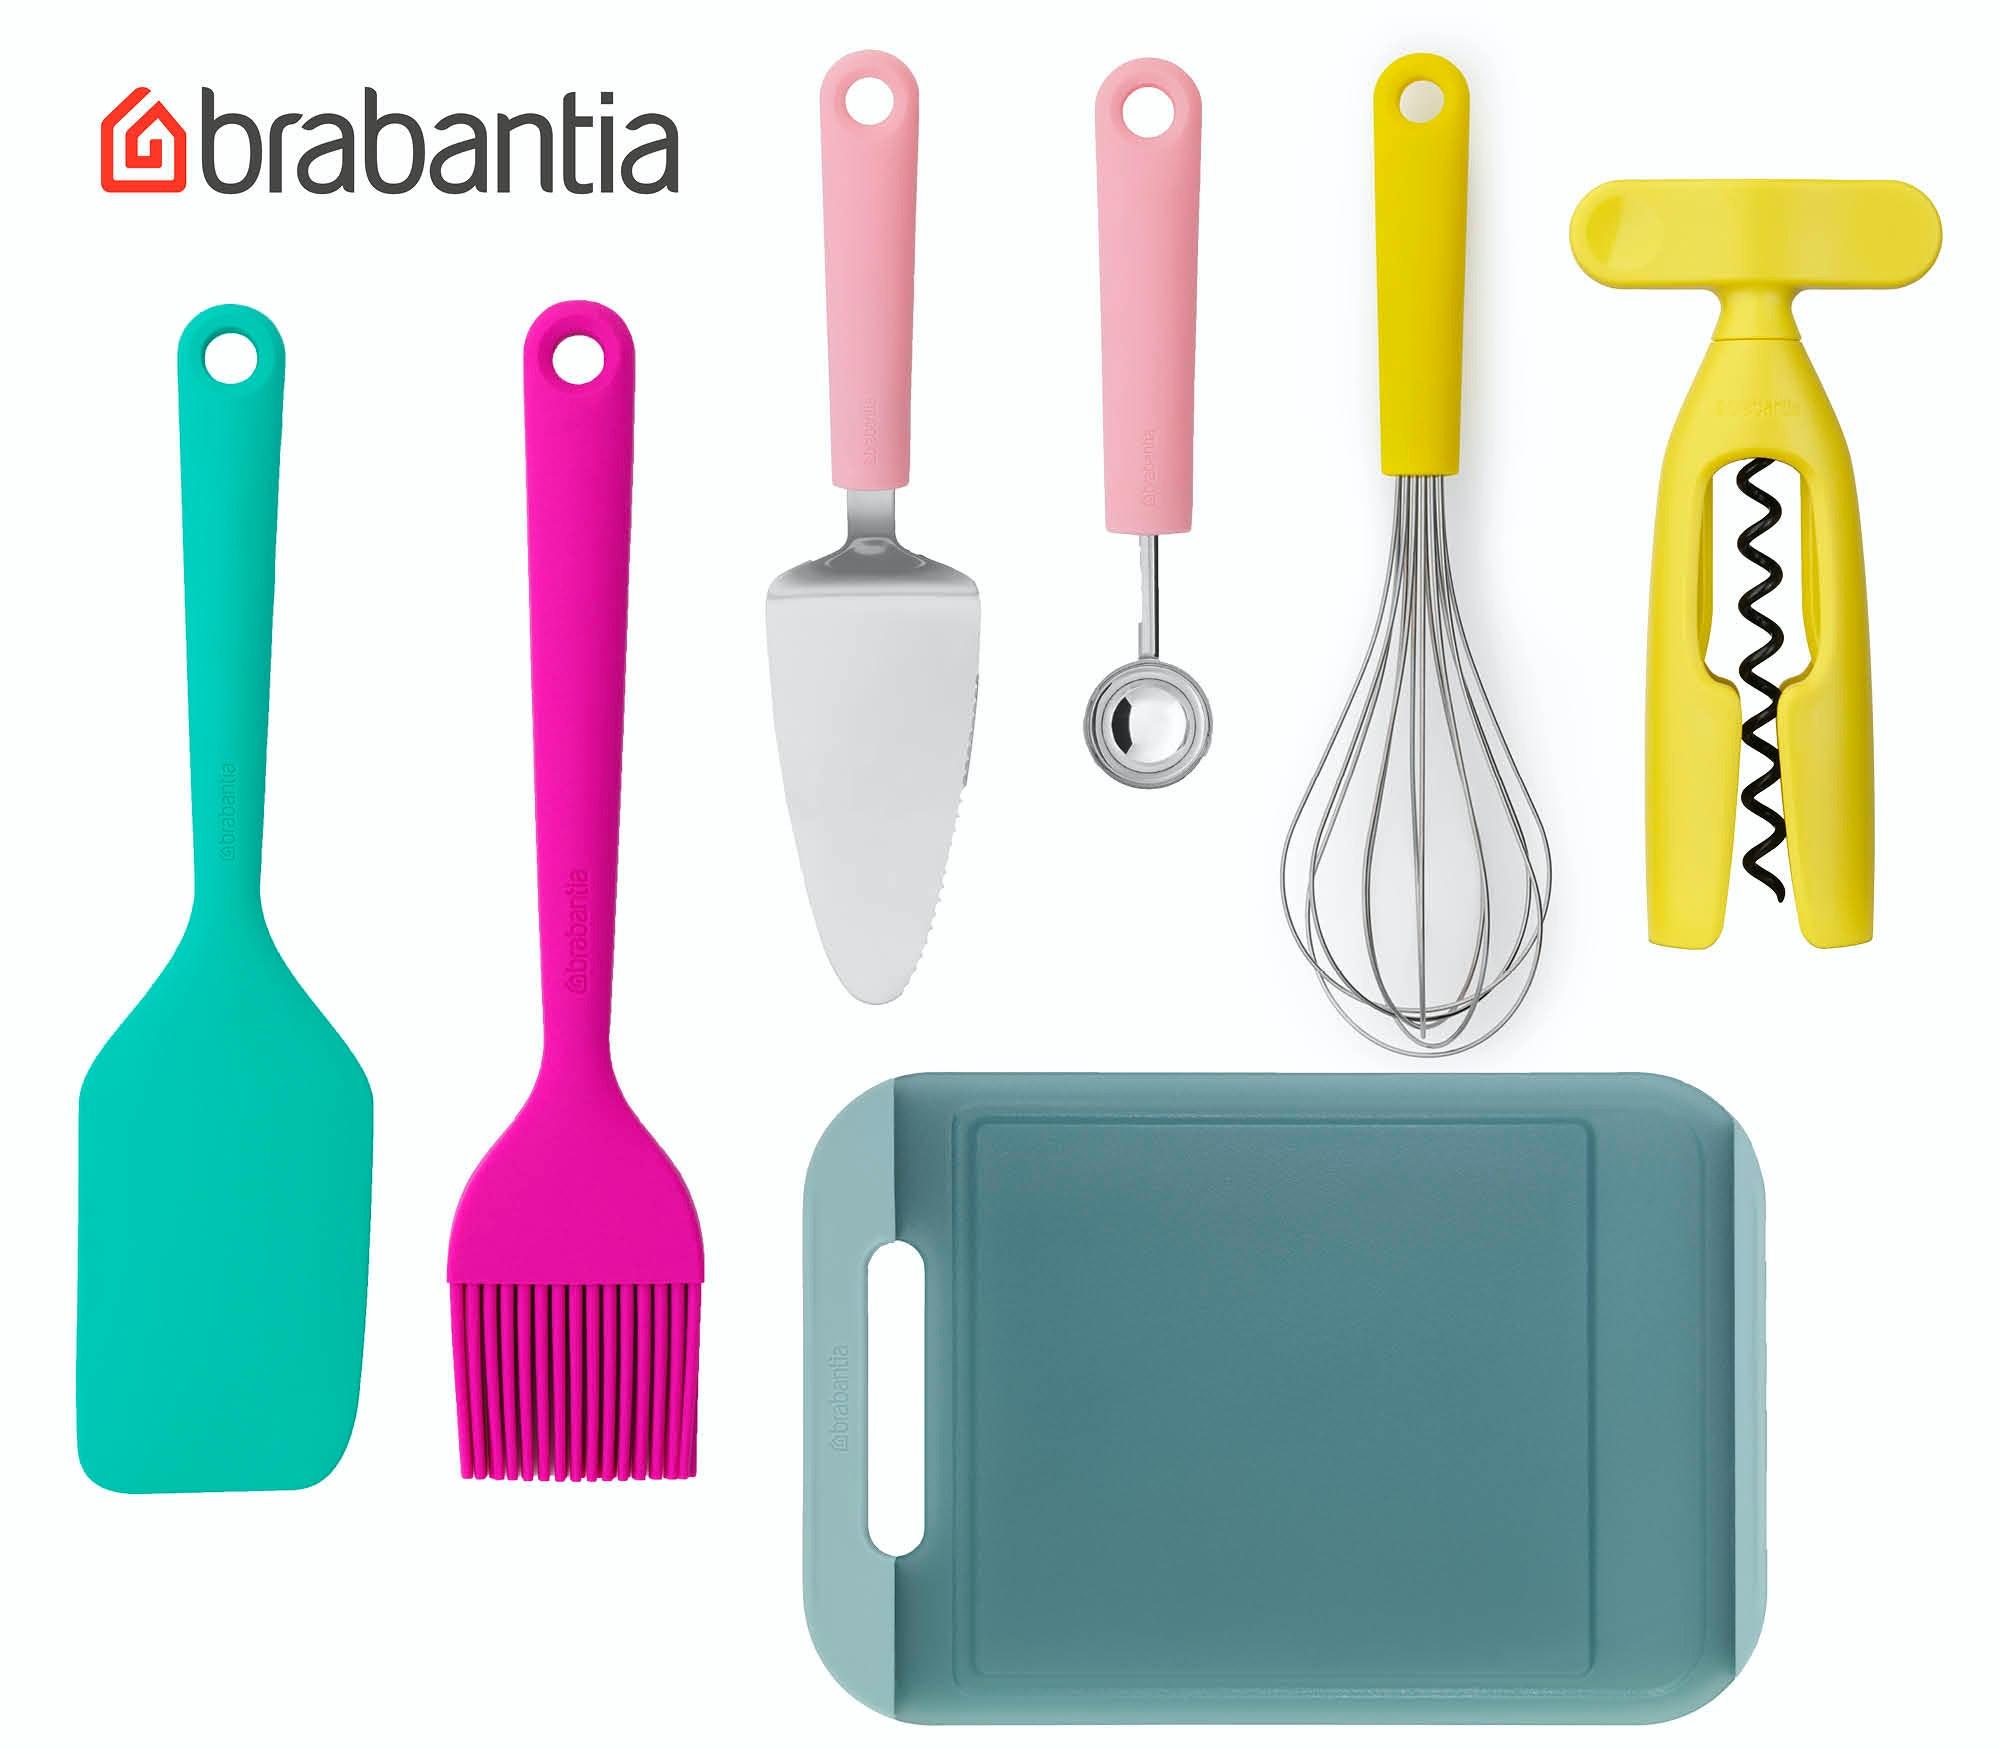 Brabantia Tasty Colours baking bundles  sweepstakes